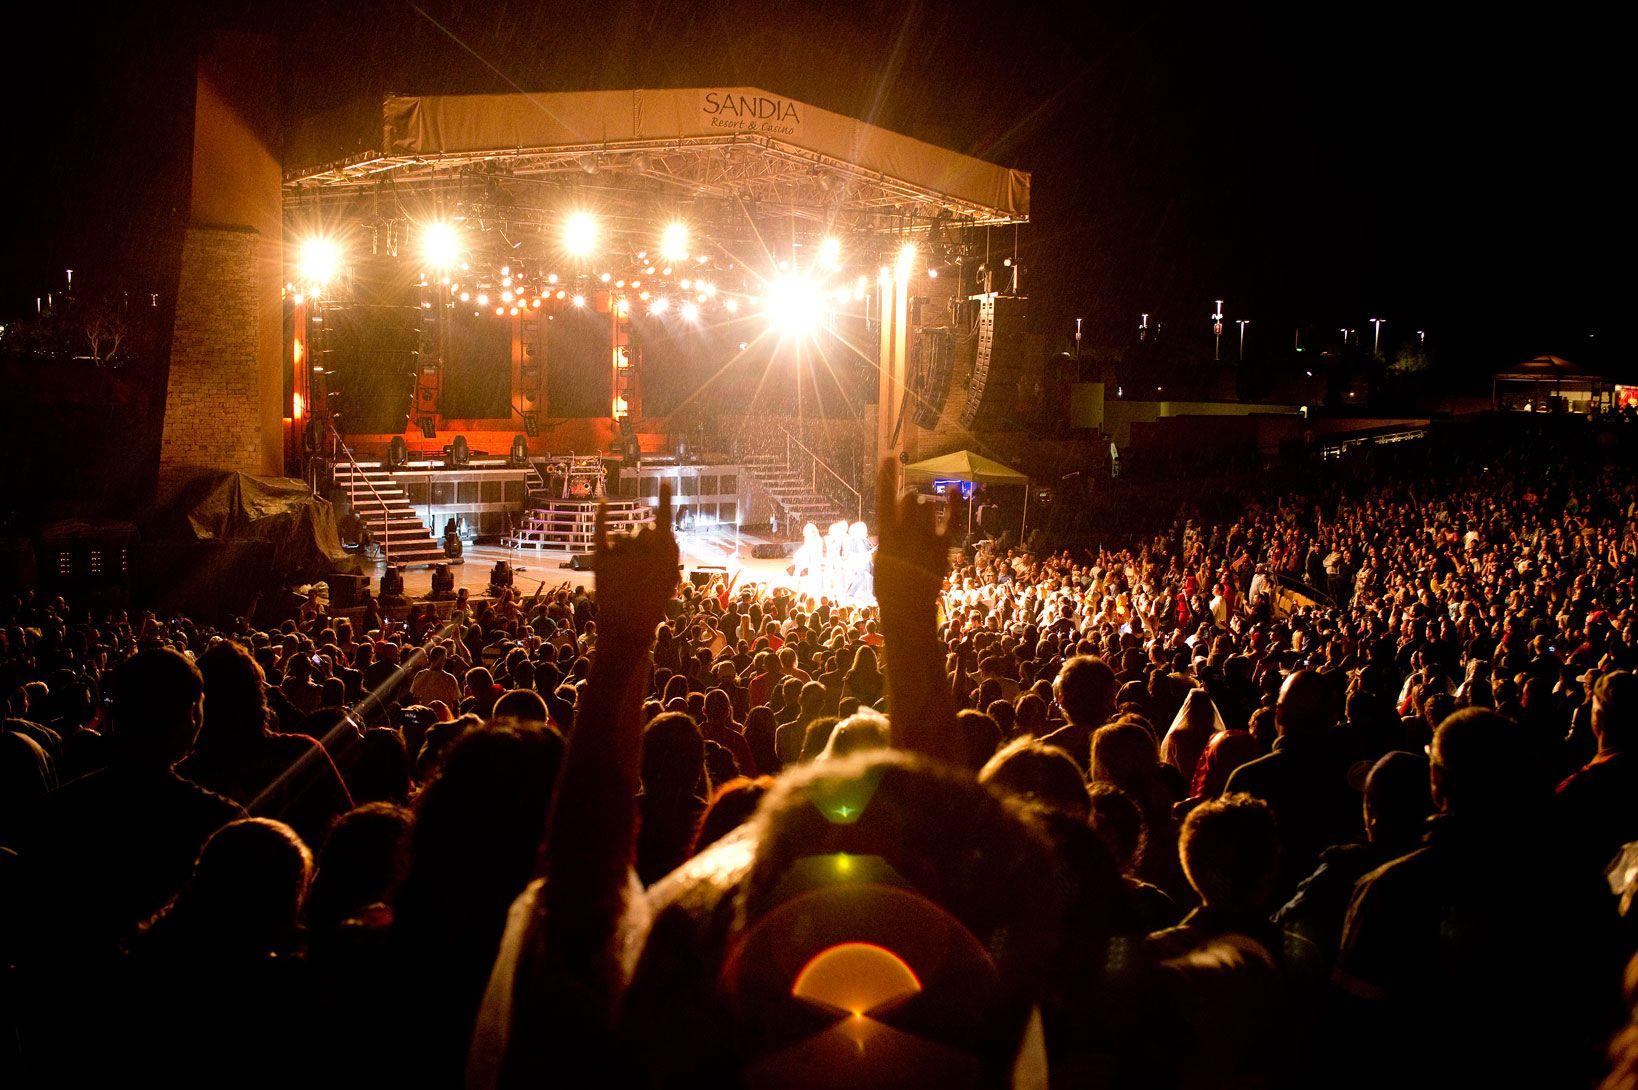 Isleta casino concerts casino.com download free